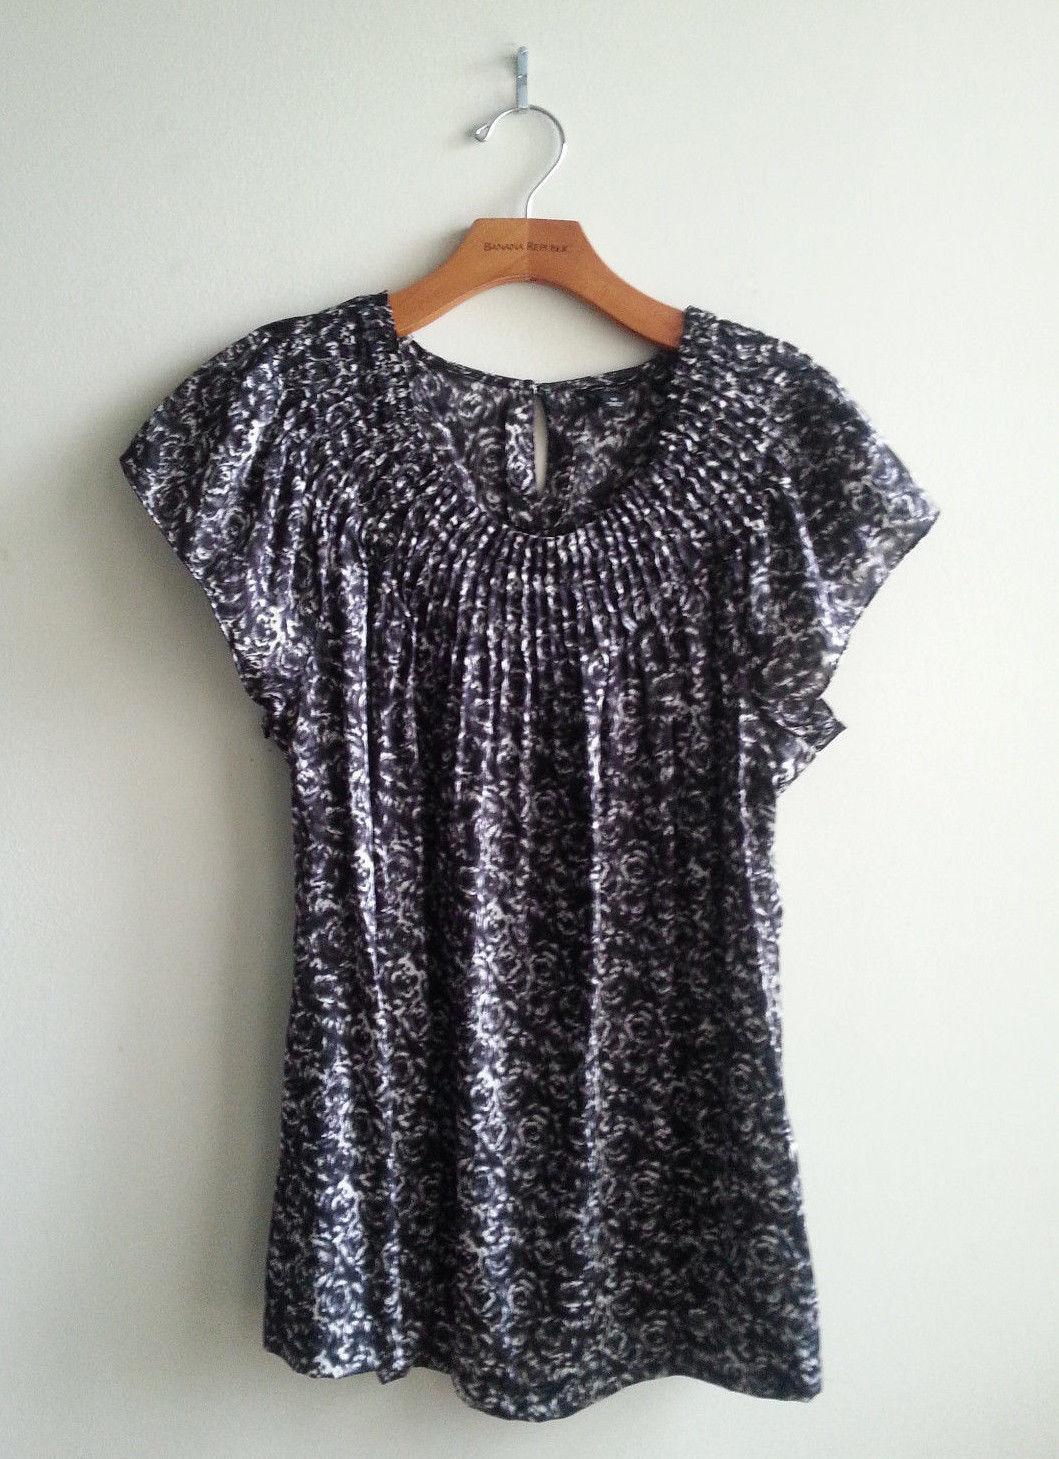 428d691fccf568 Banana Republic Silk Top Blouse Black White and 50 similar items. S l1600